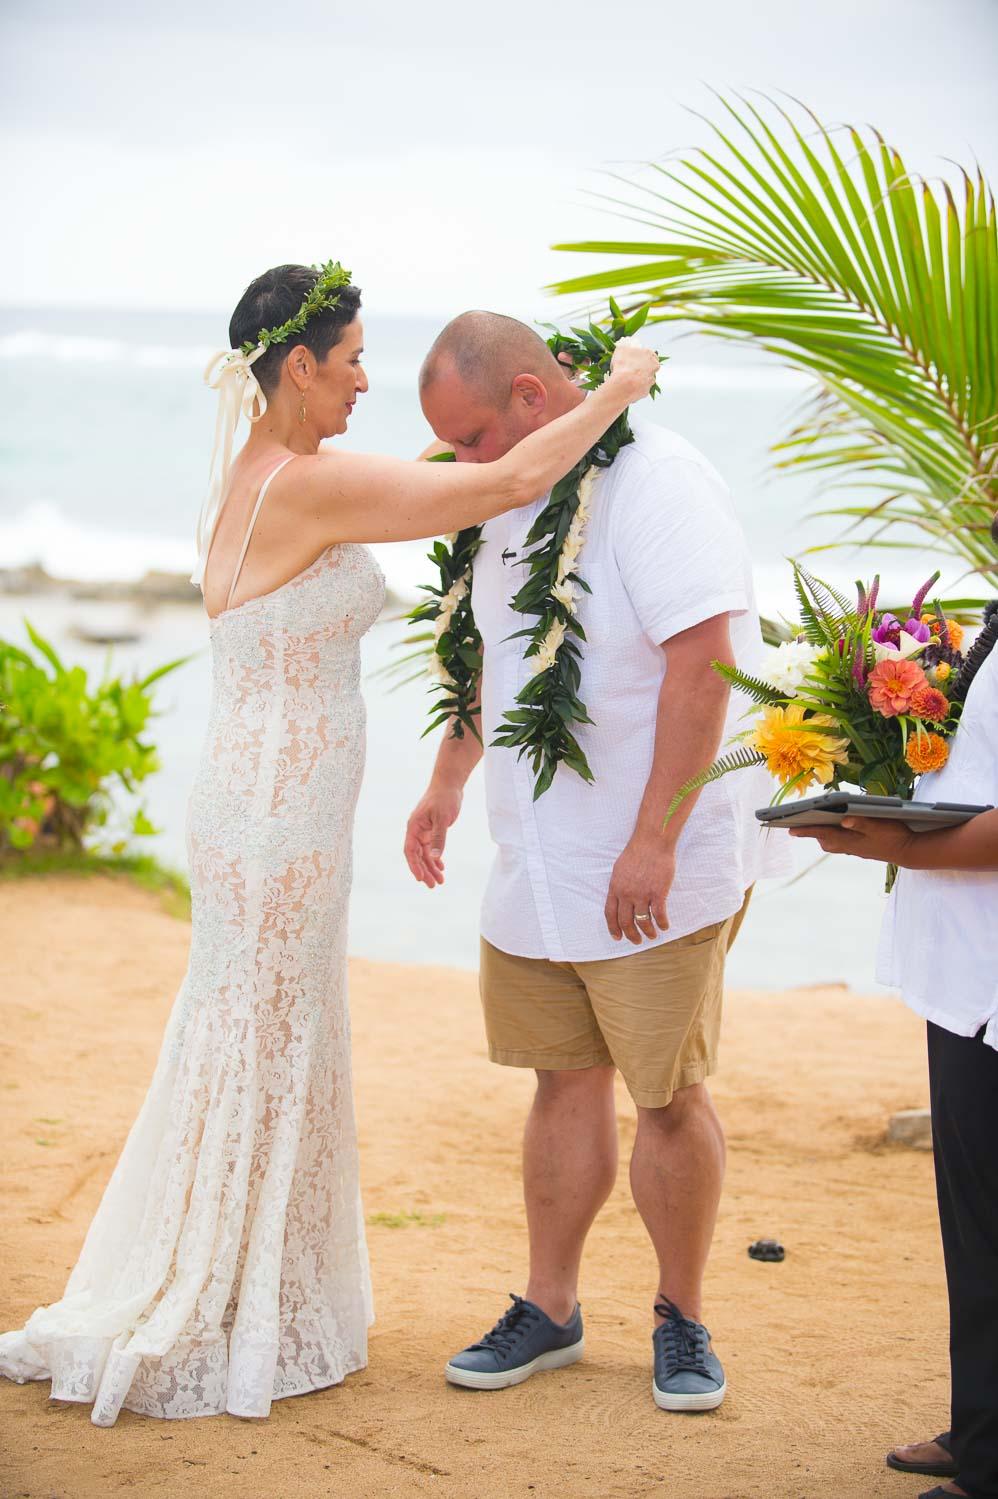 maui-wedding-photography-maui-wedding-venue-Tad-Craig-Photography-13.jpg